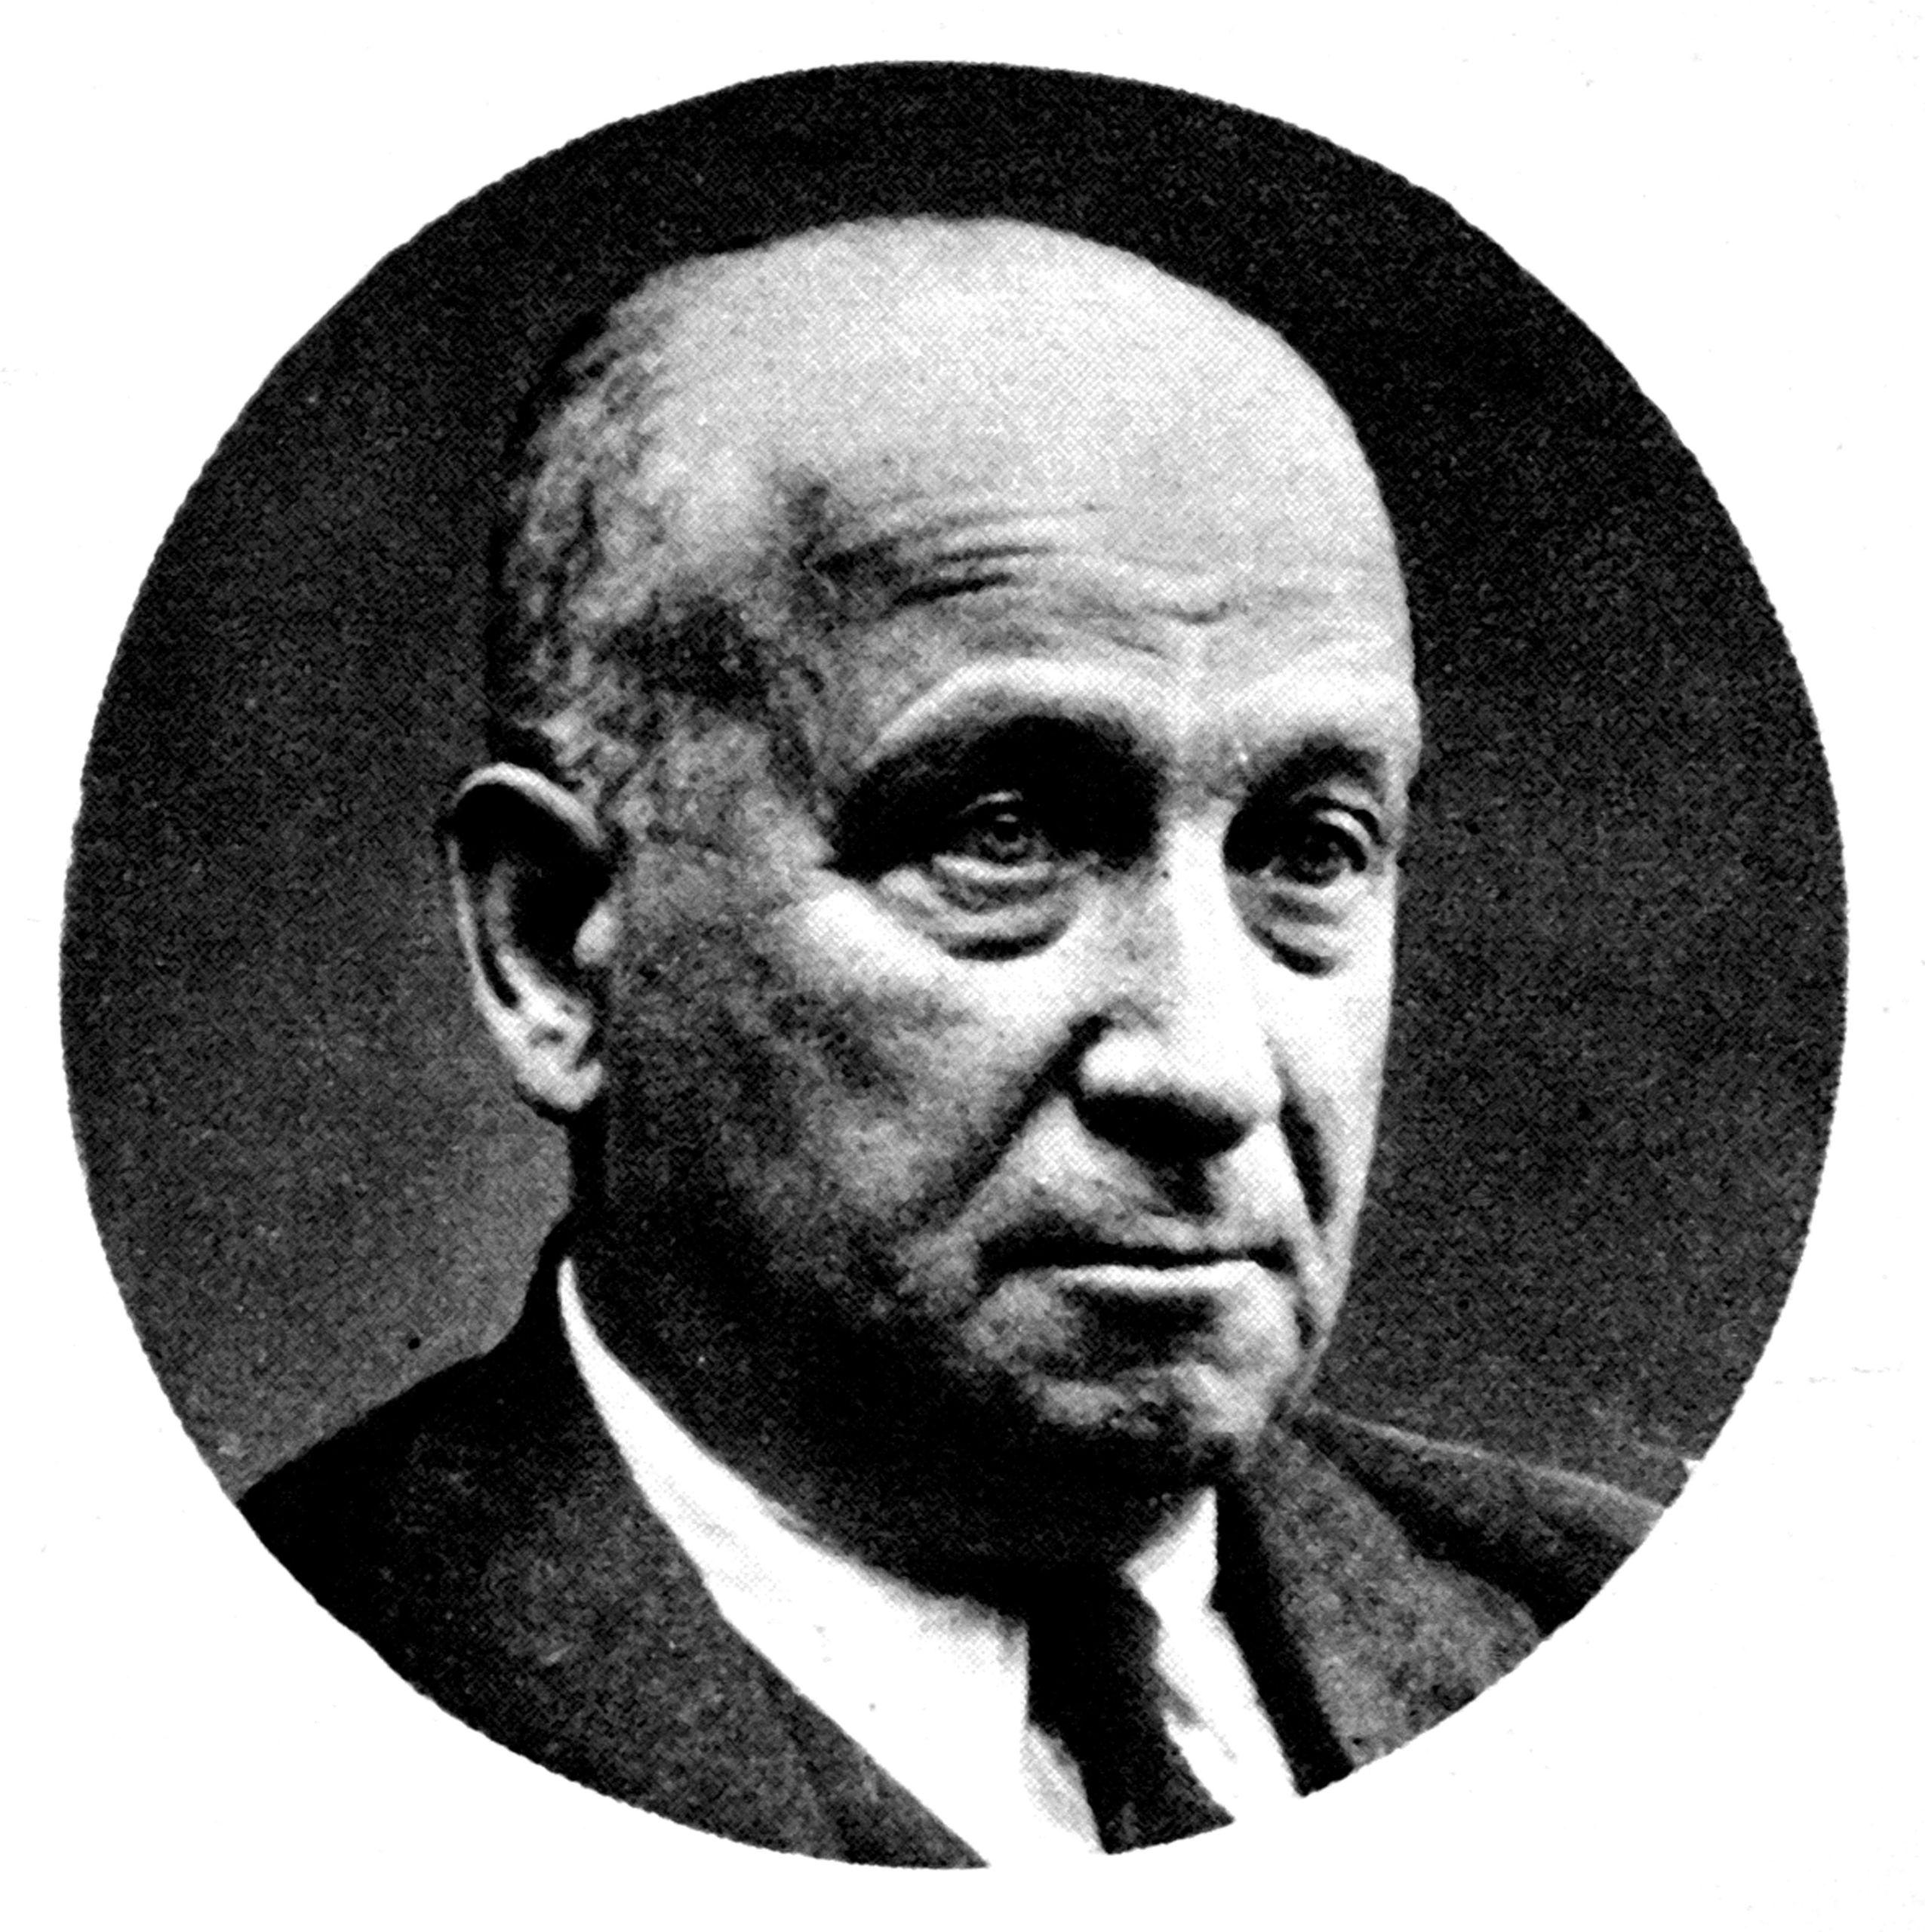 Francisco Largo Caballero, líder del PSOE